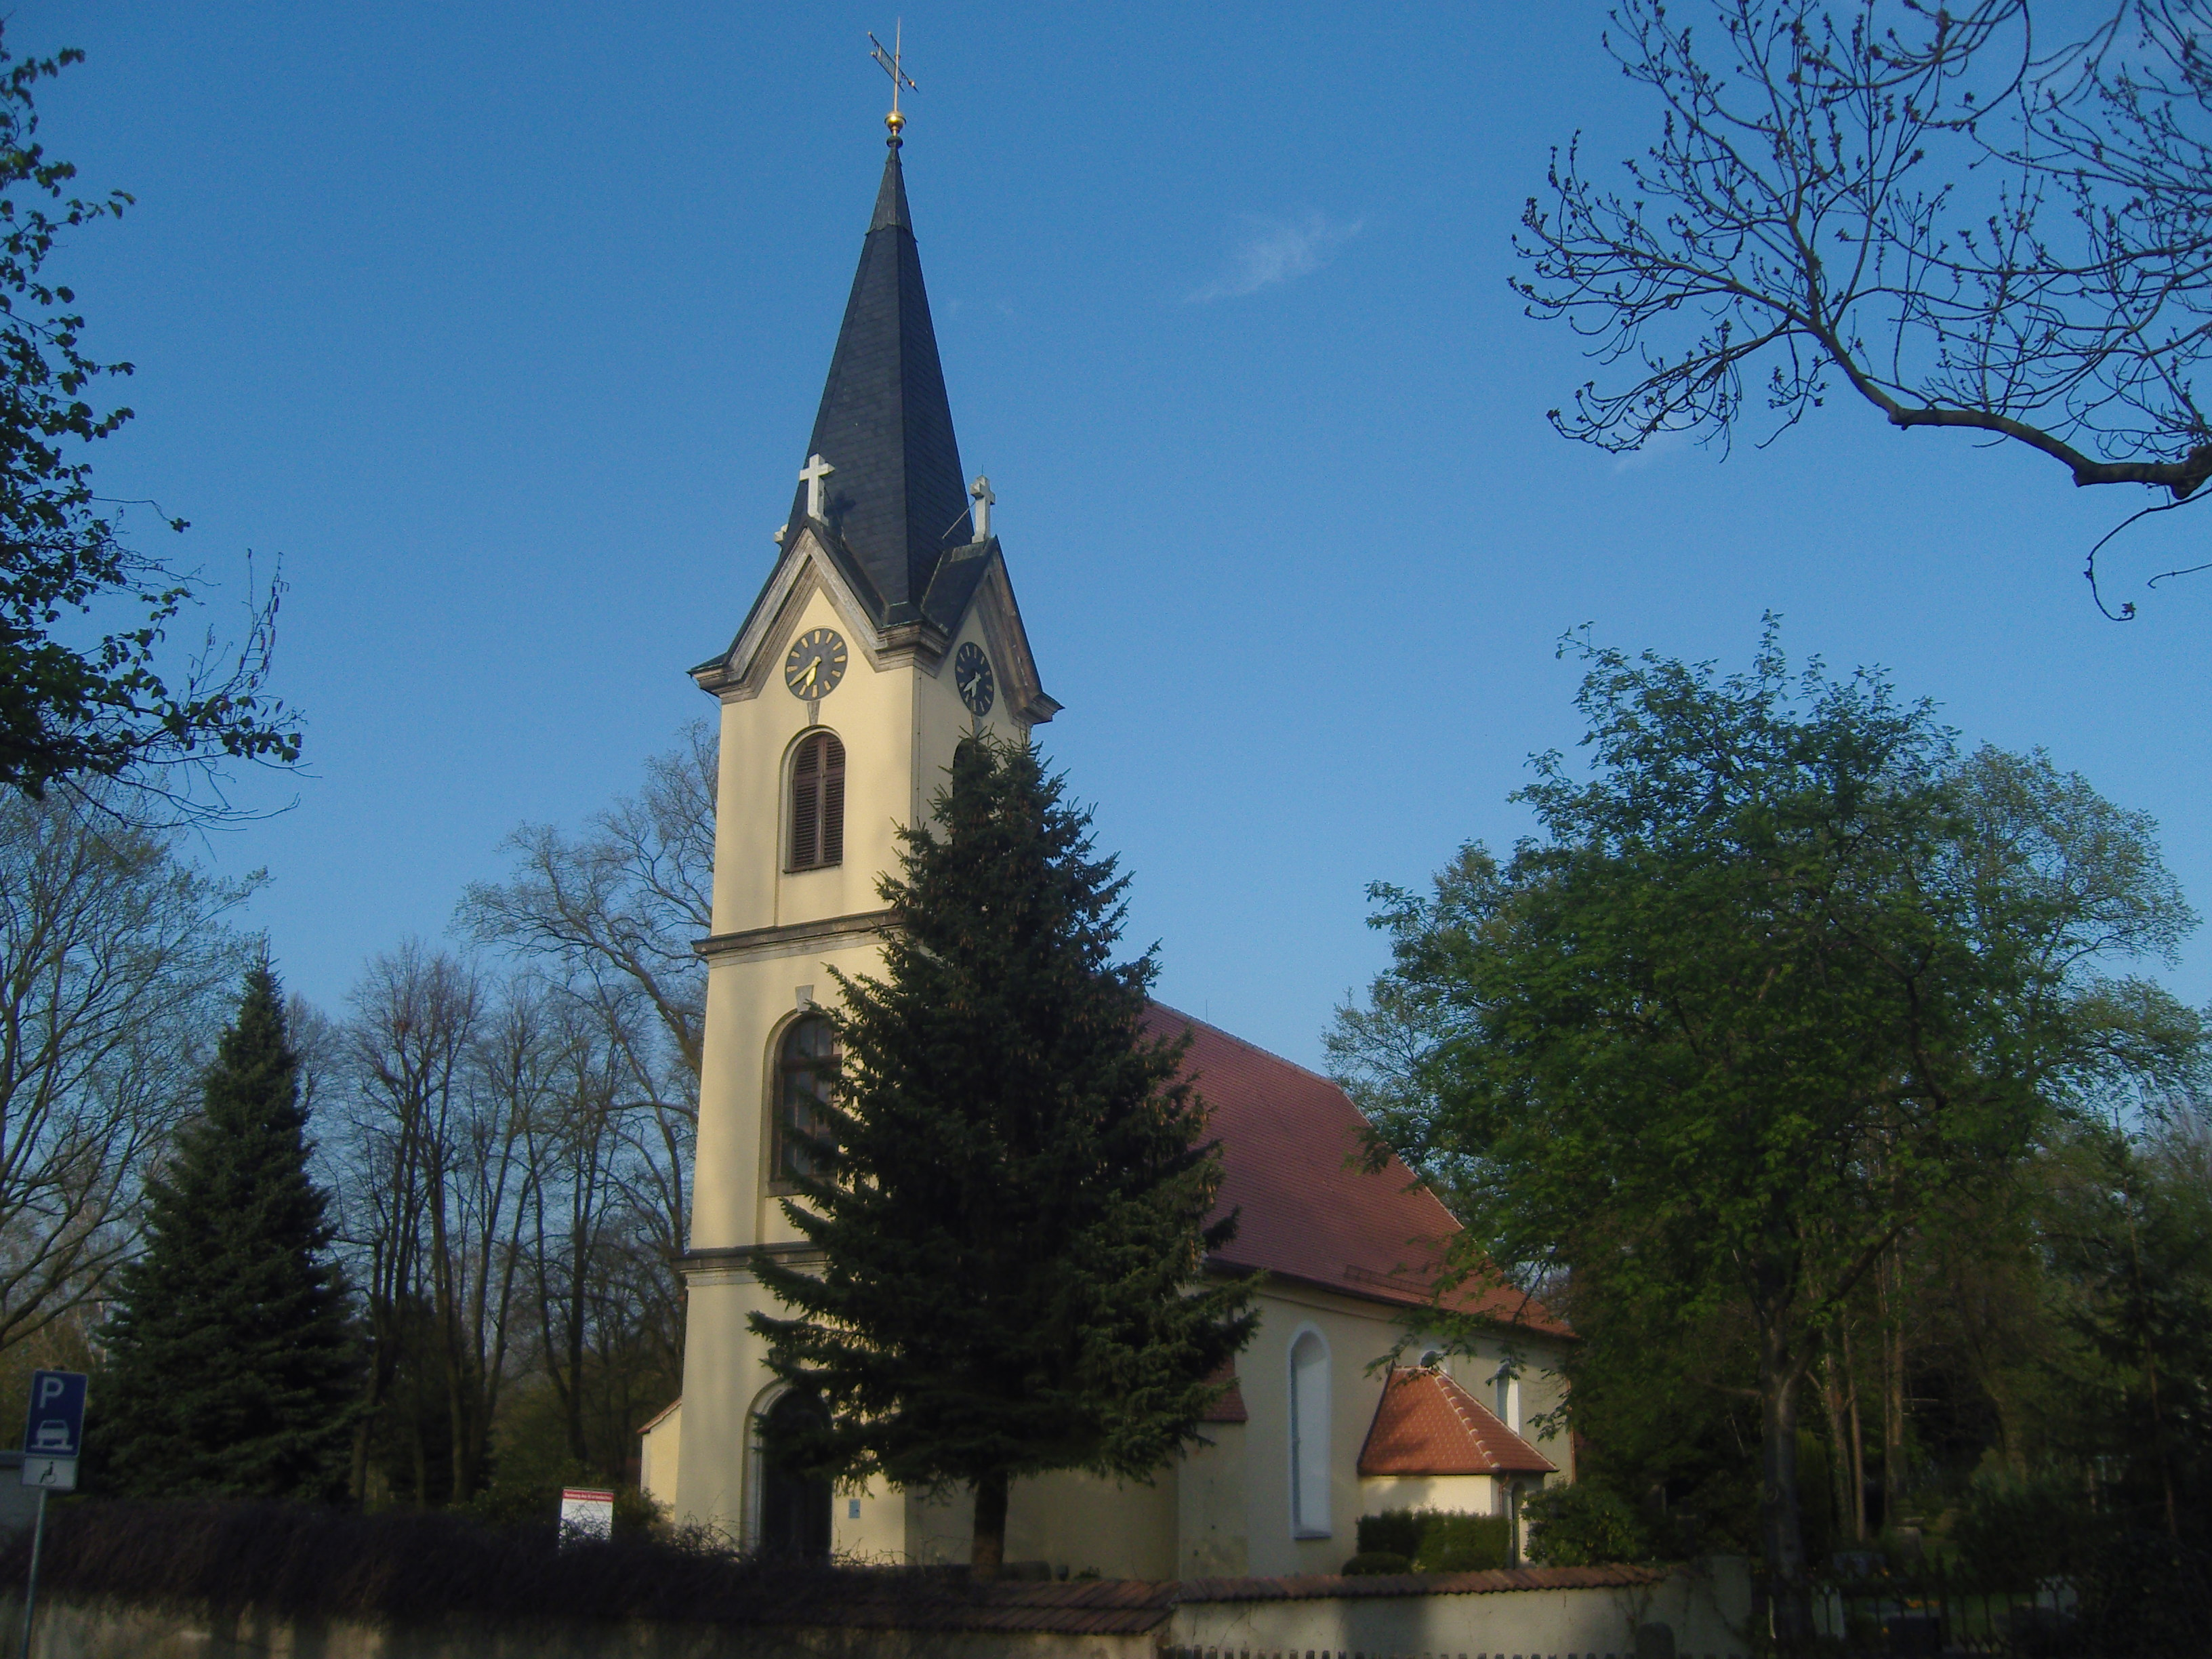 Schwepnitzi vald